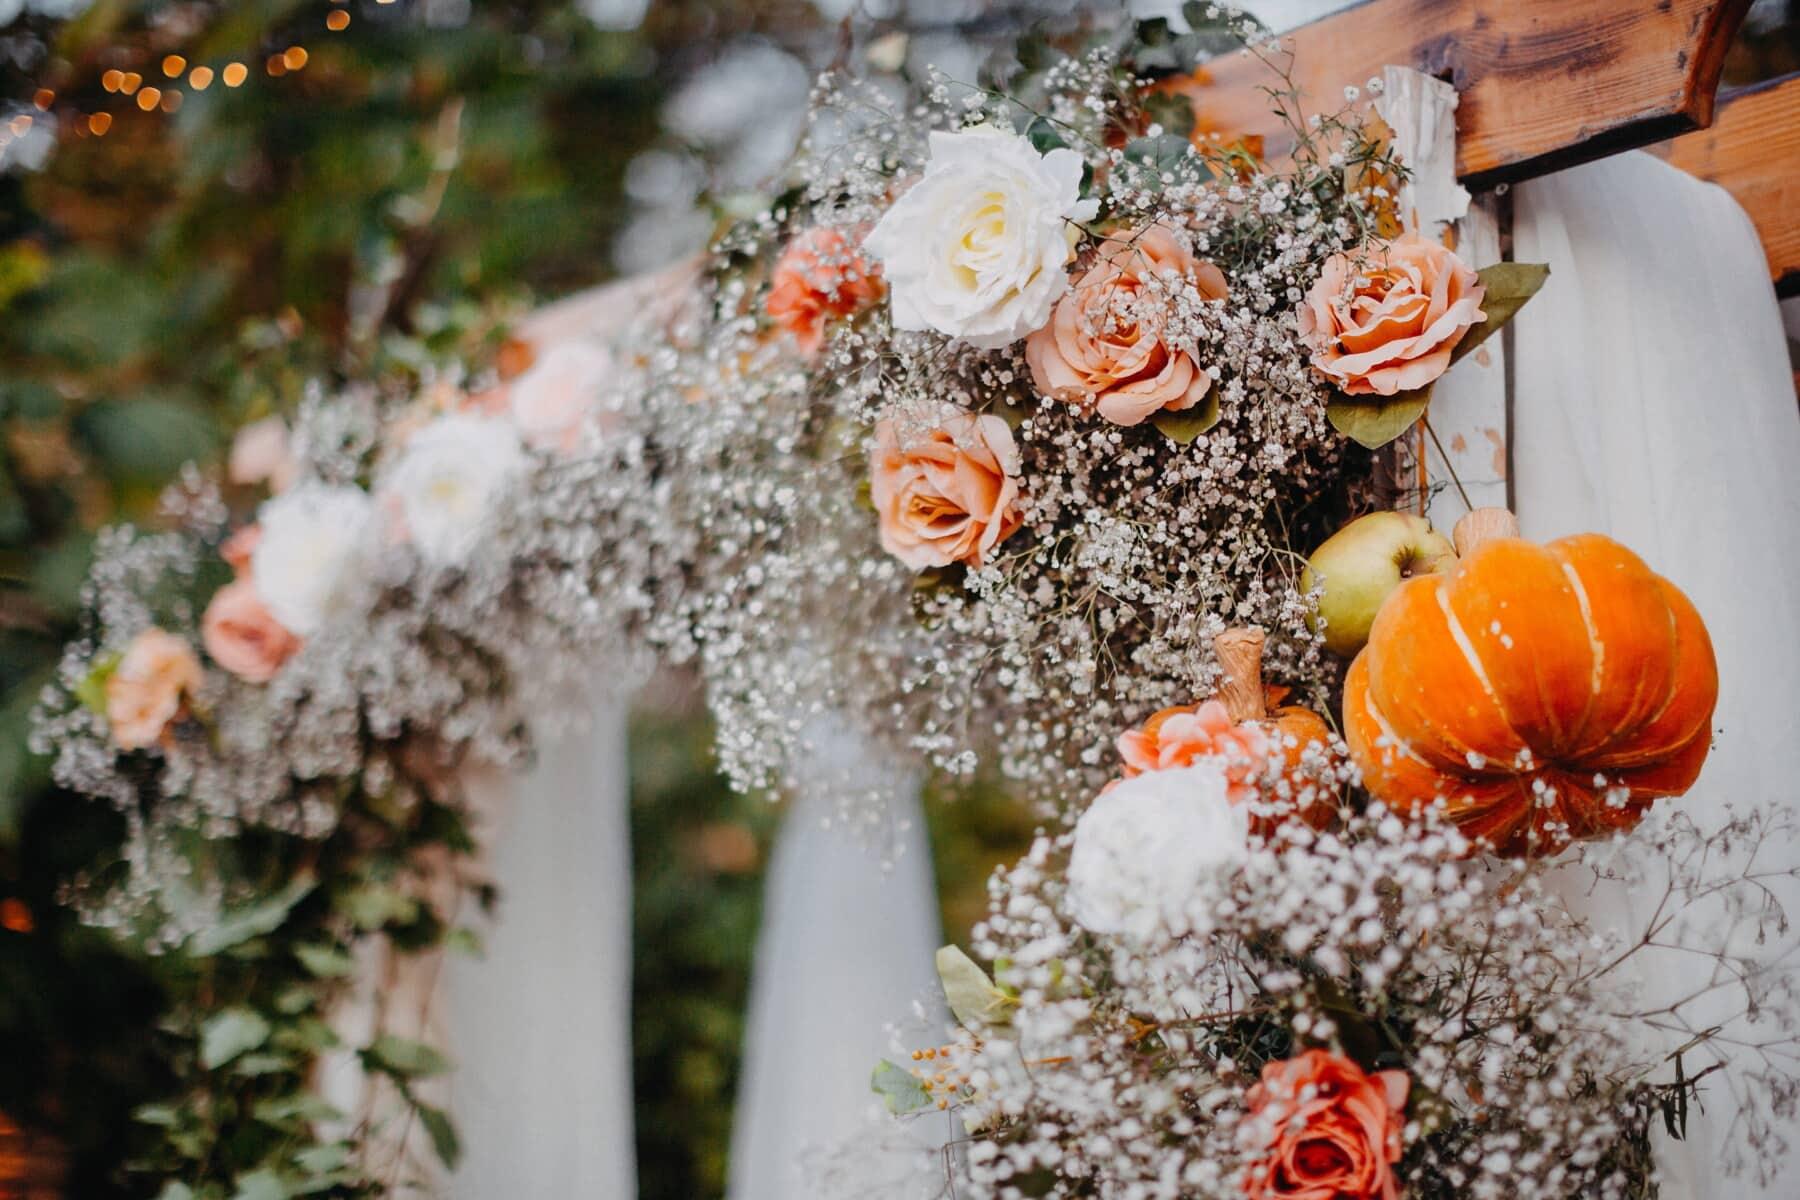 wedding venue, autumn season, flower garden, pumpkin, bouquet, decoration, leaf, flower, outdoors, garden